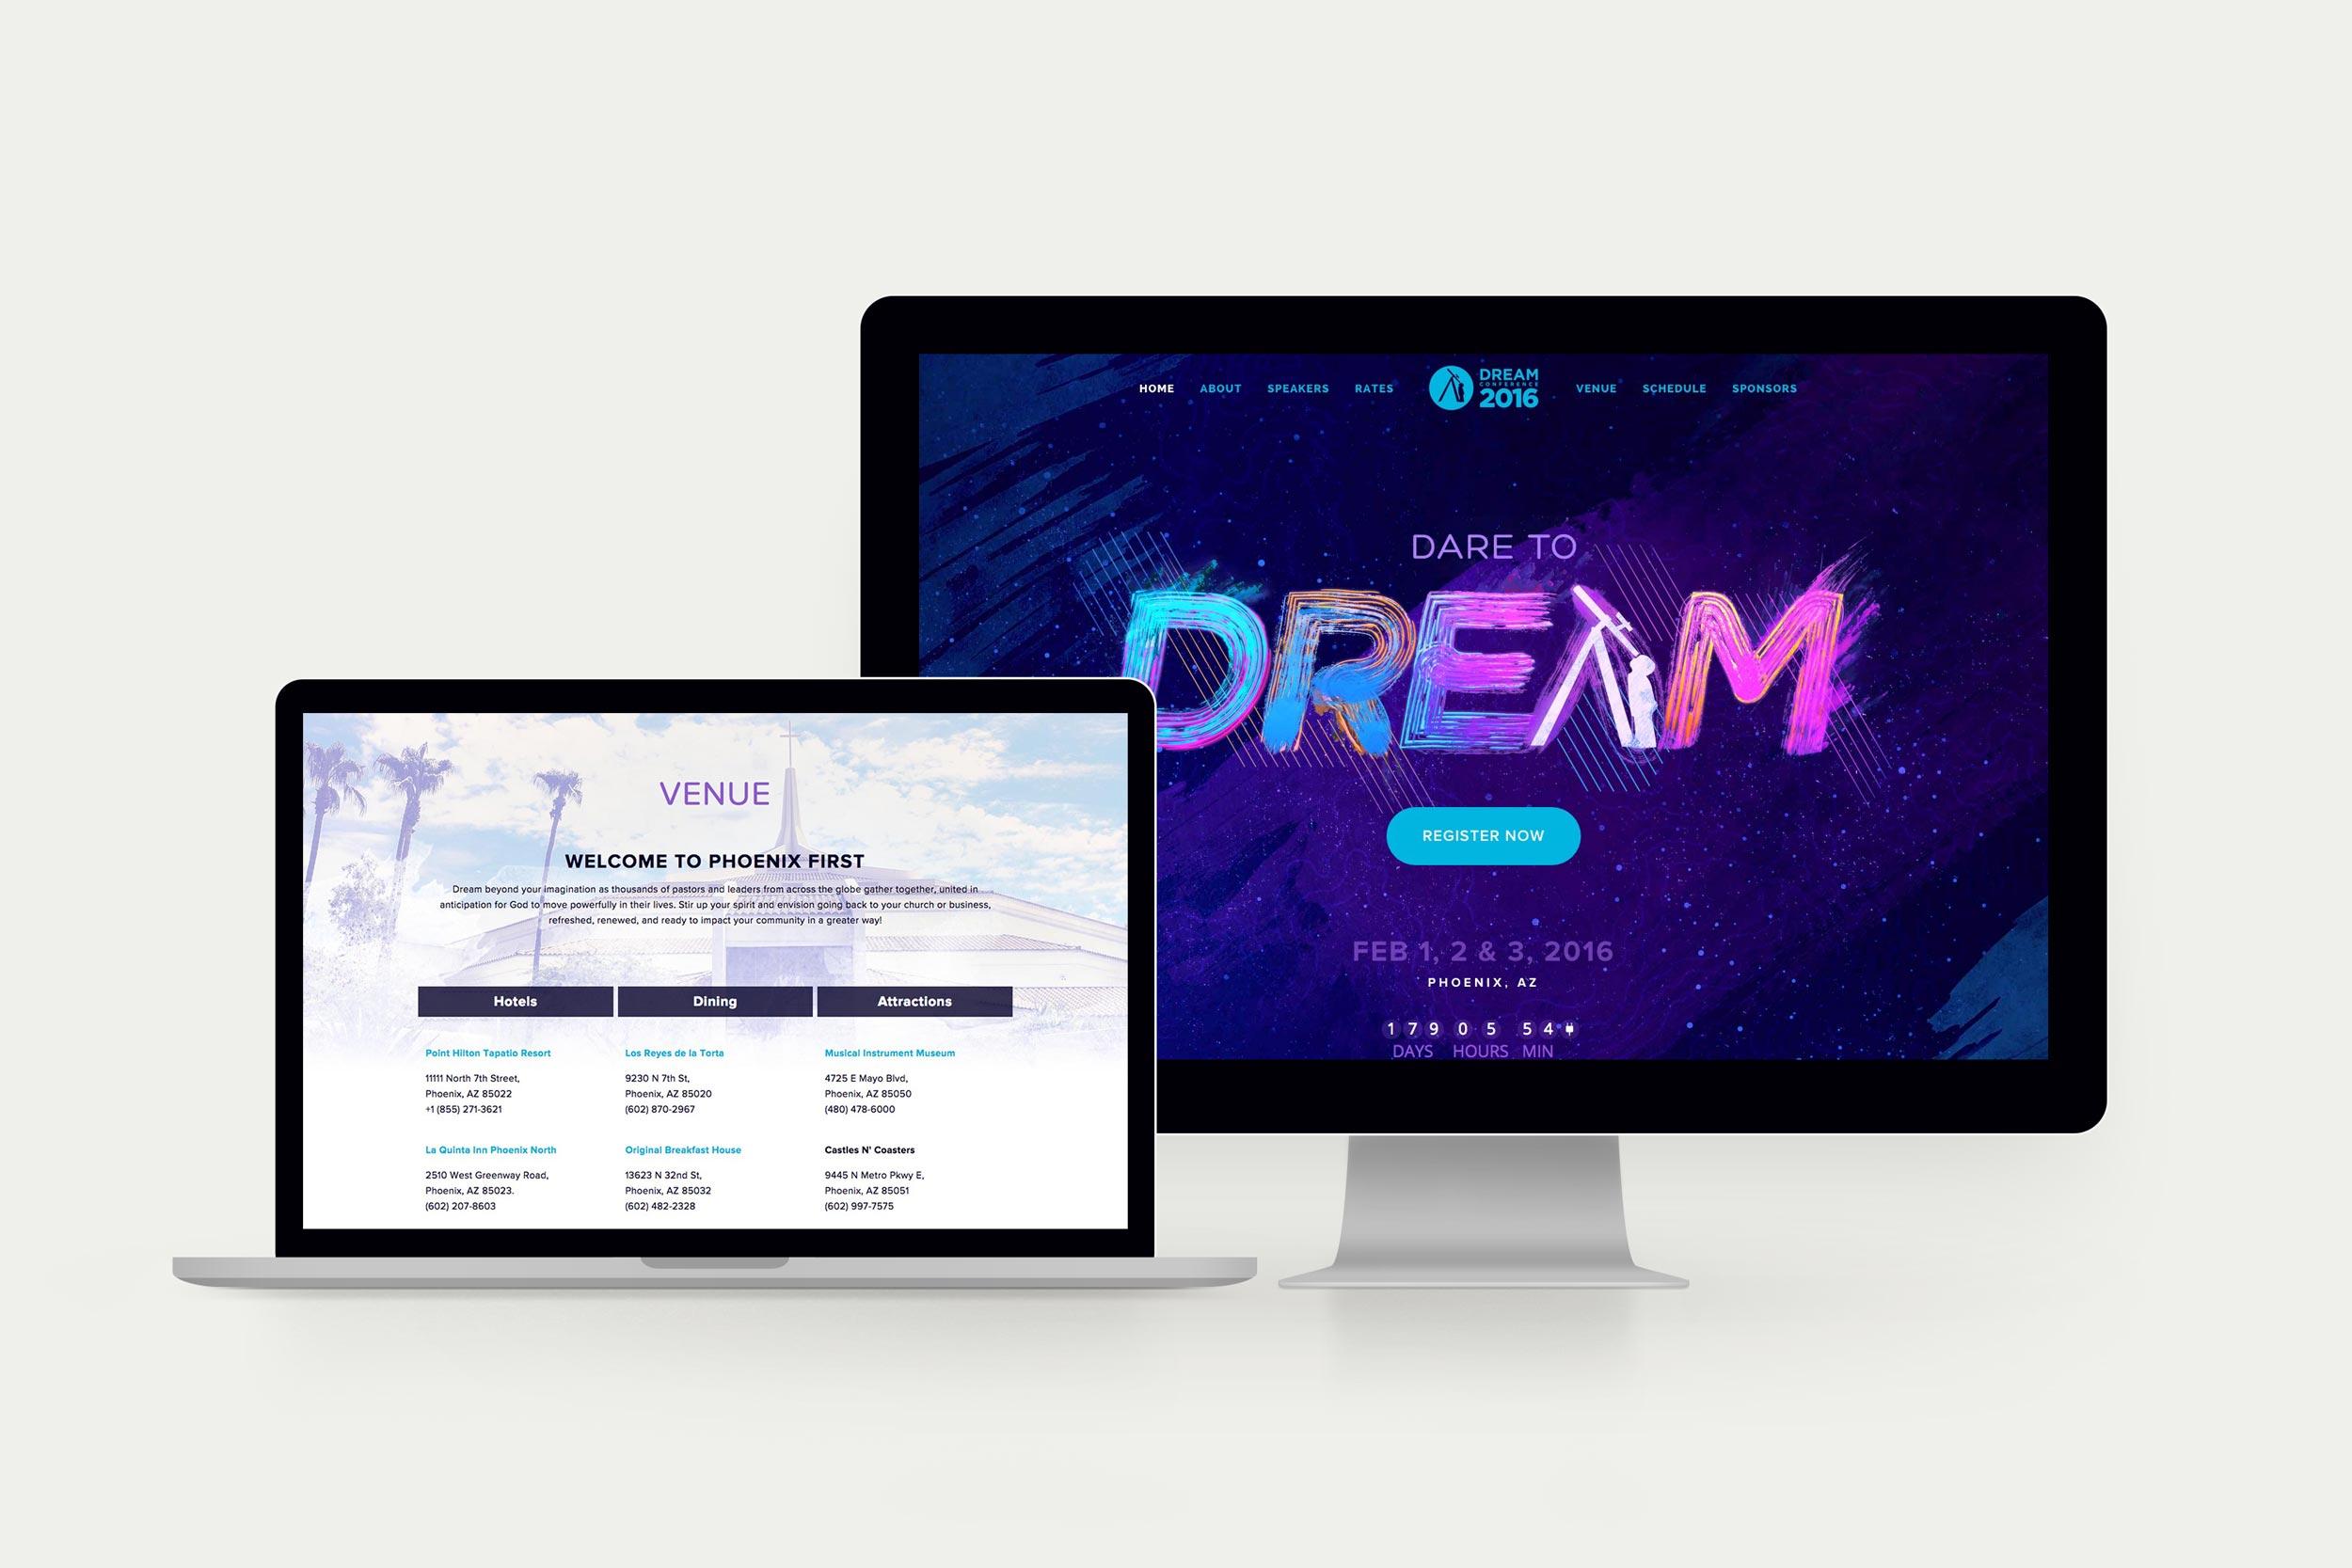 Website design for the 2016 Dream Conference site.Image copyright Jeff Miller, HellothisisJeff Design LLC